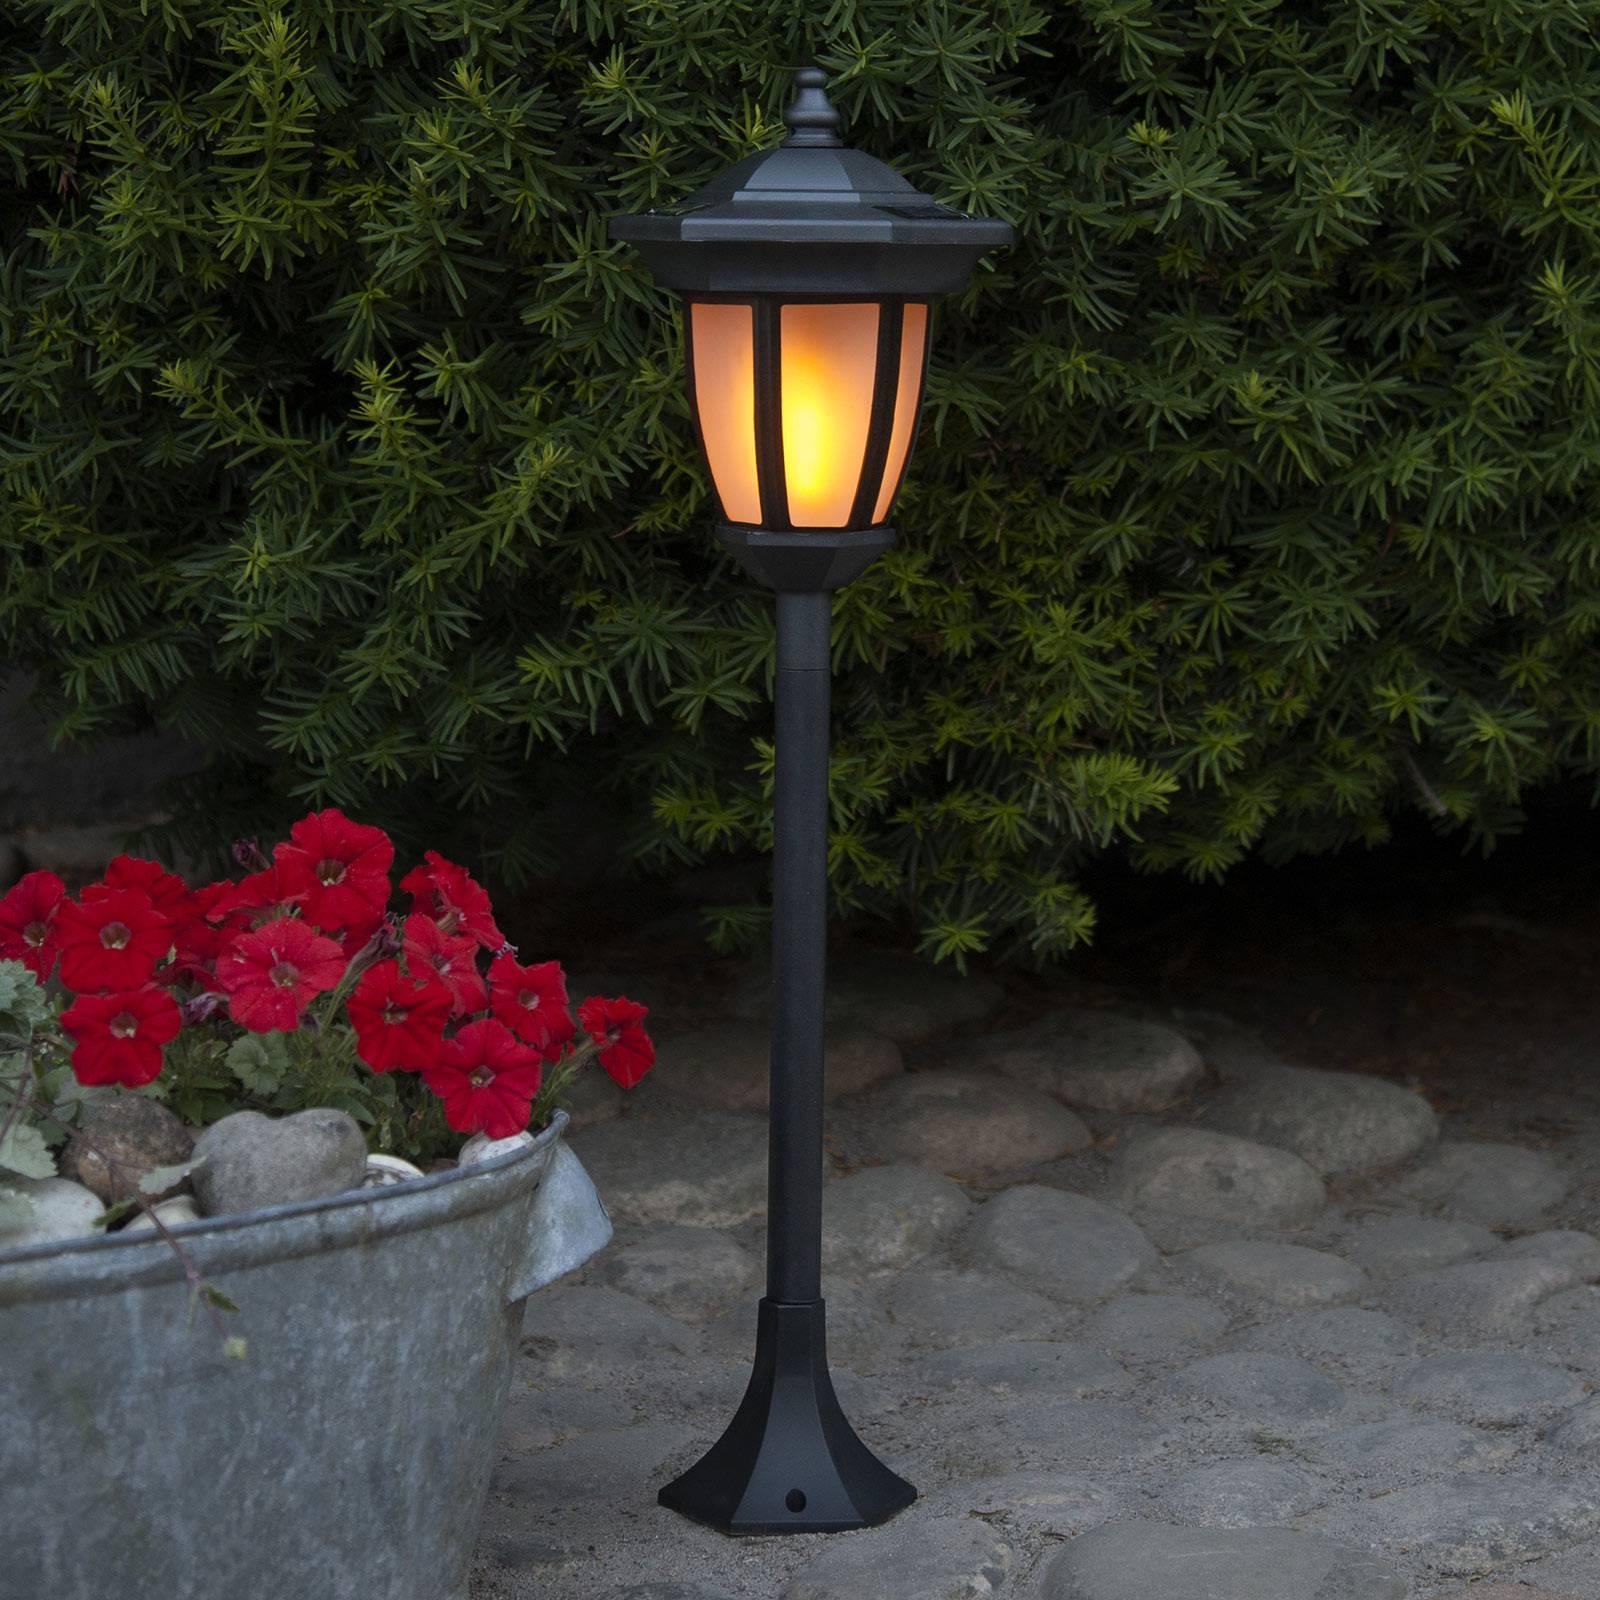 LED-Solarleuchte Flame, 4 in 1, schwarz